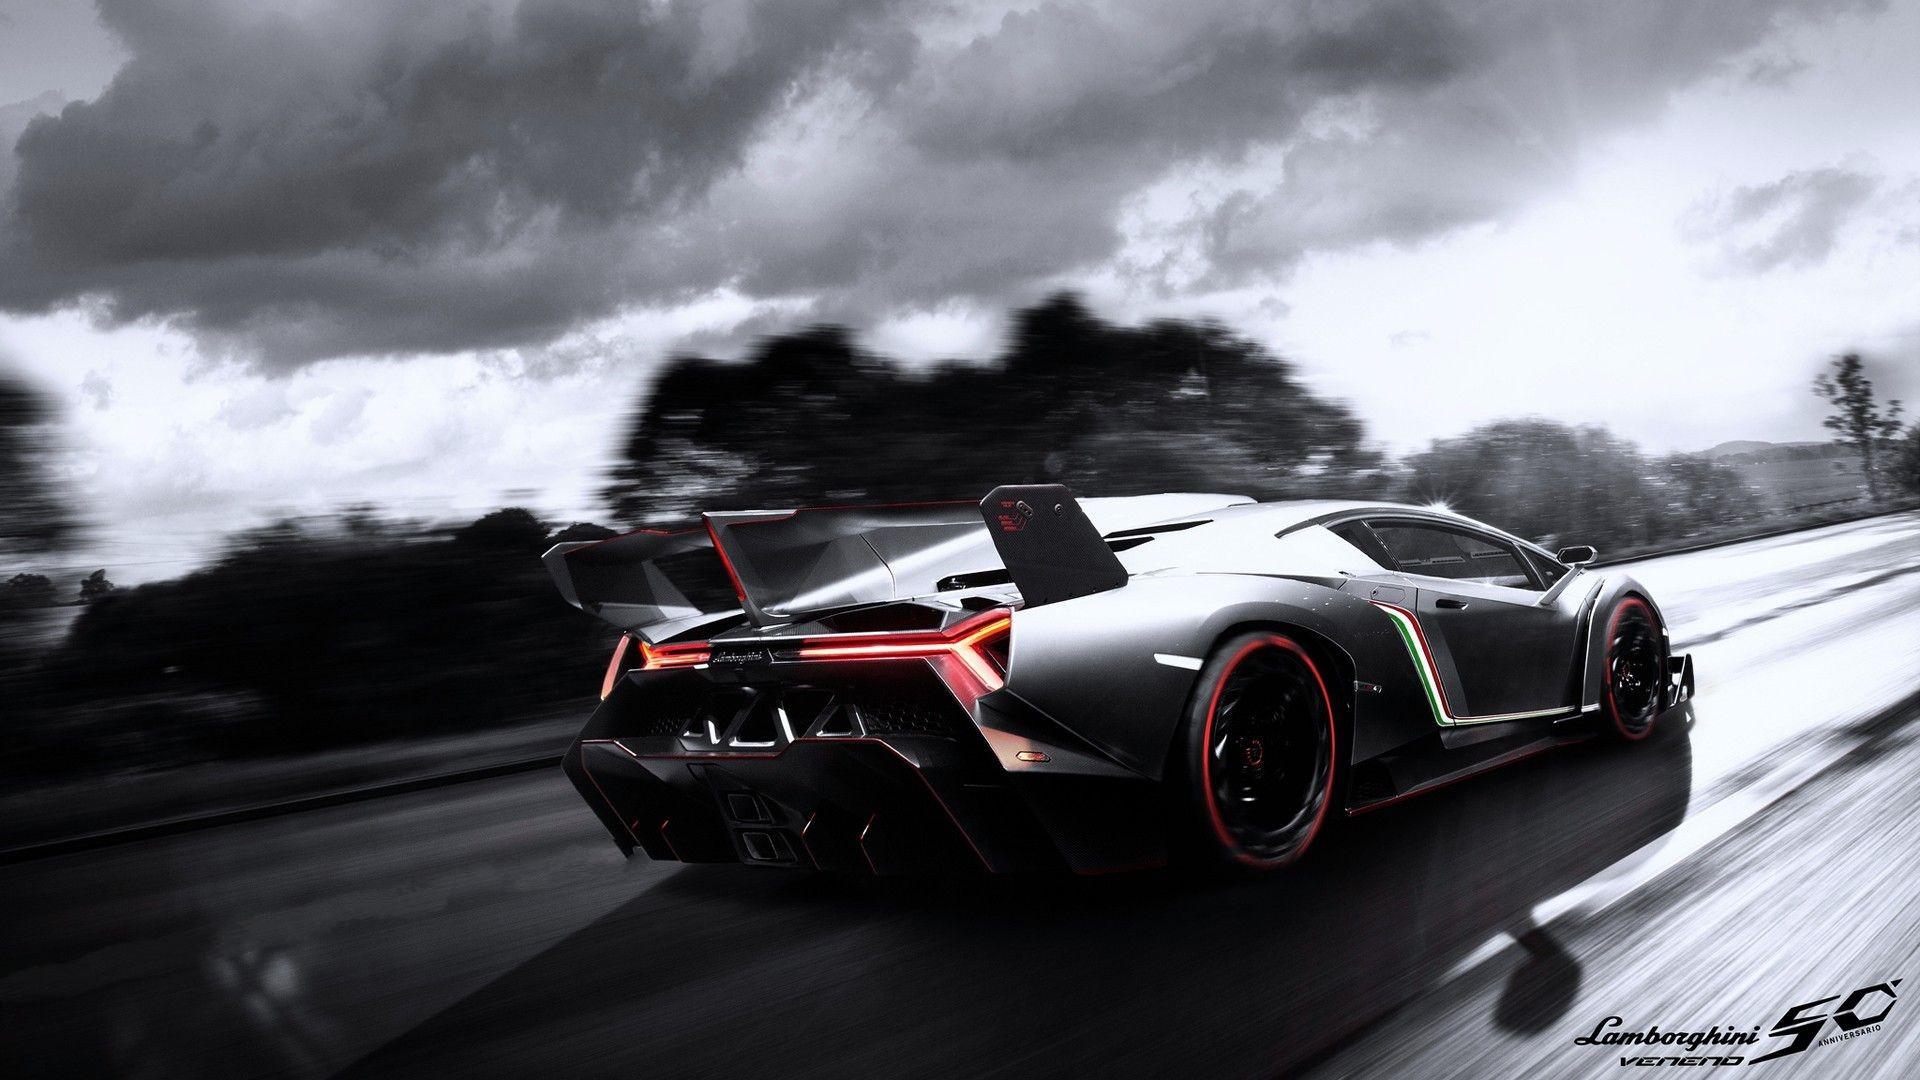 Lamborghini Veneno Wallpapers.